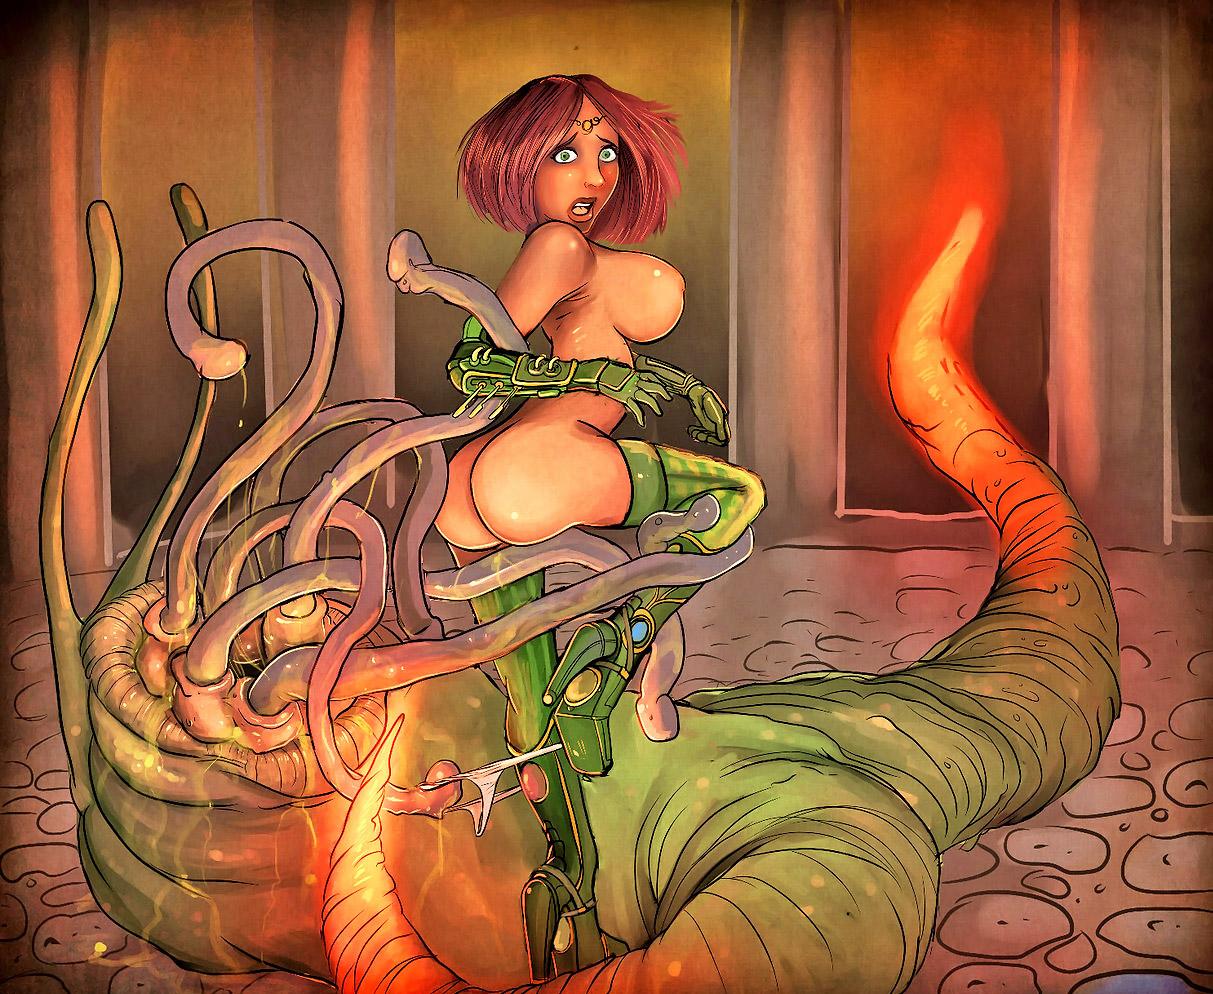 Alien Hentai Sex Slave Captions - monster attack porn monster sex nude cartoon 6 - MegaPornX